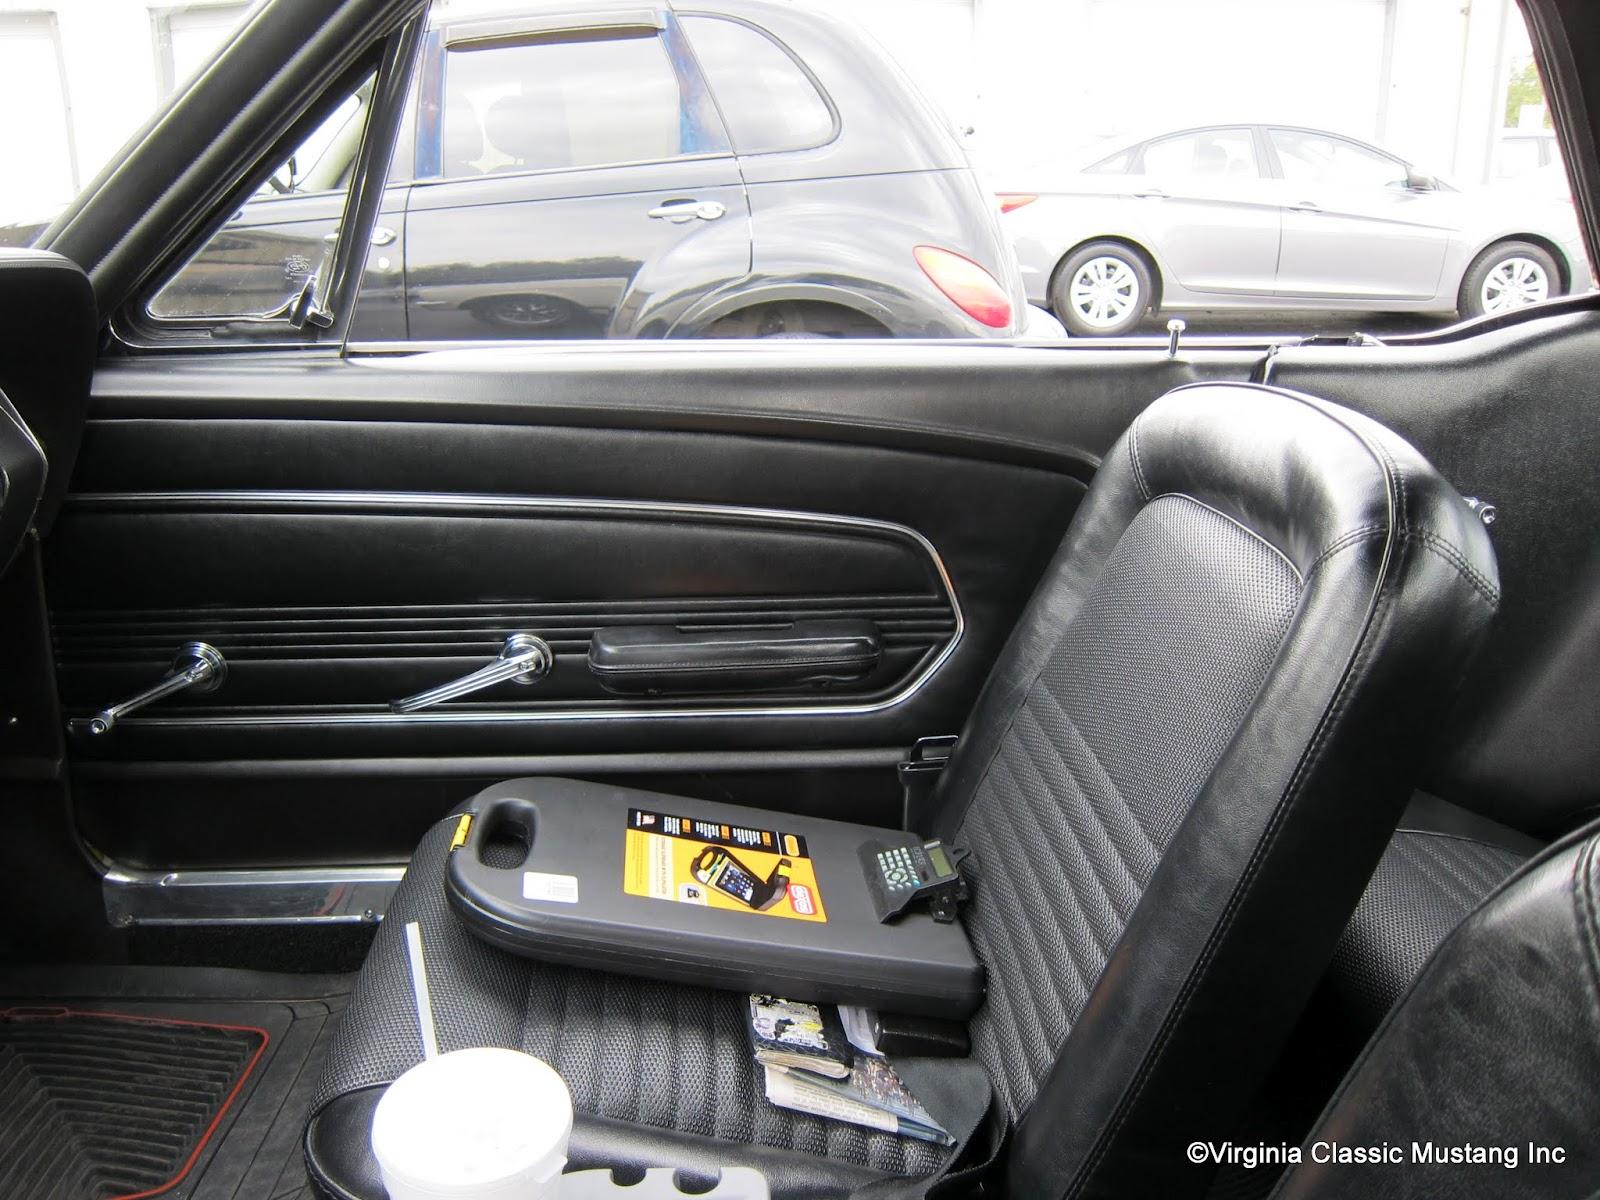 Virginia Classic Mustang Blog Customer Car 1967 Mustang